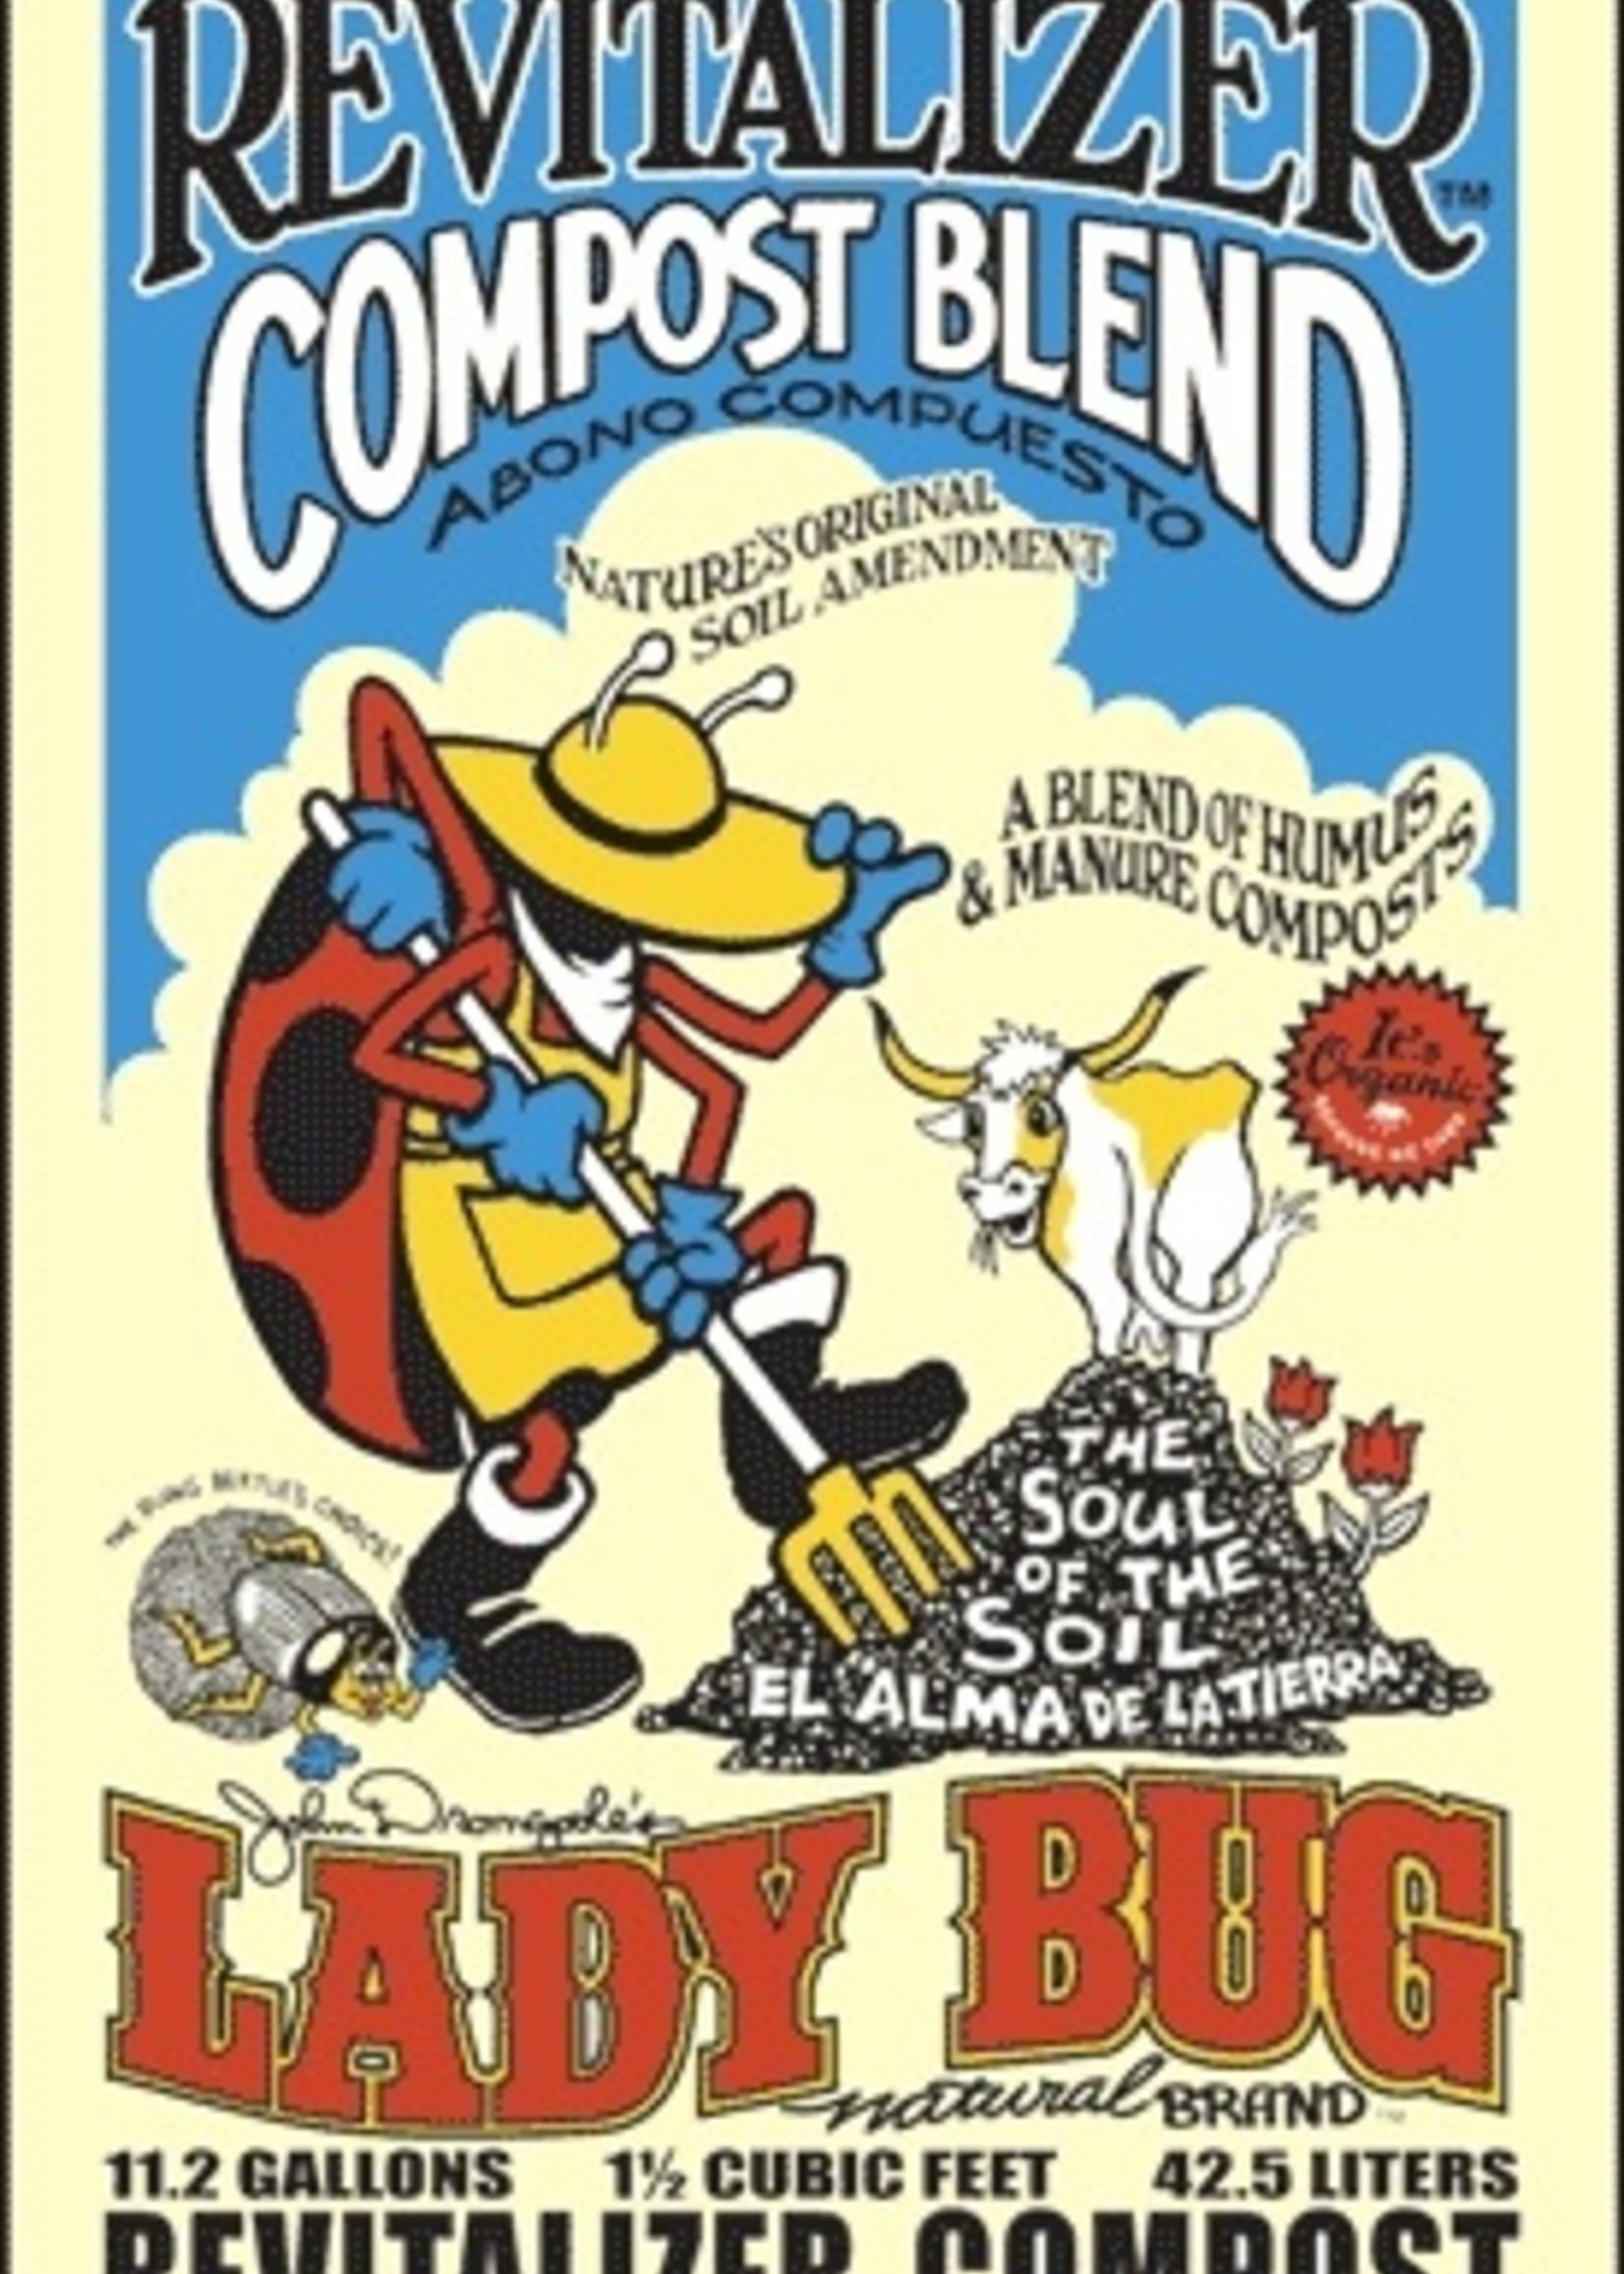 LADY BUG Revitalizer Compost 1.5 CF